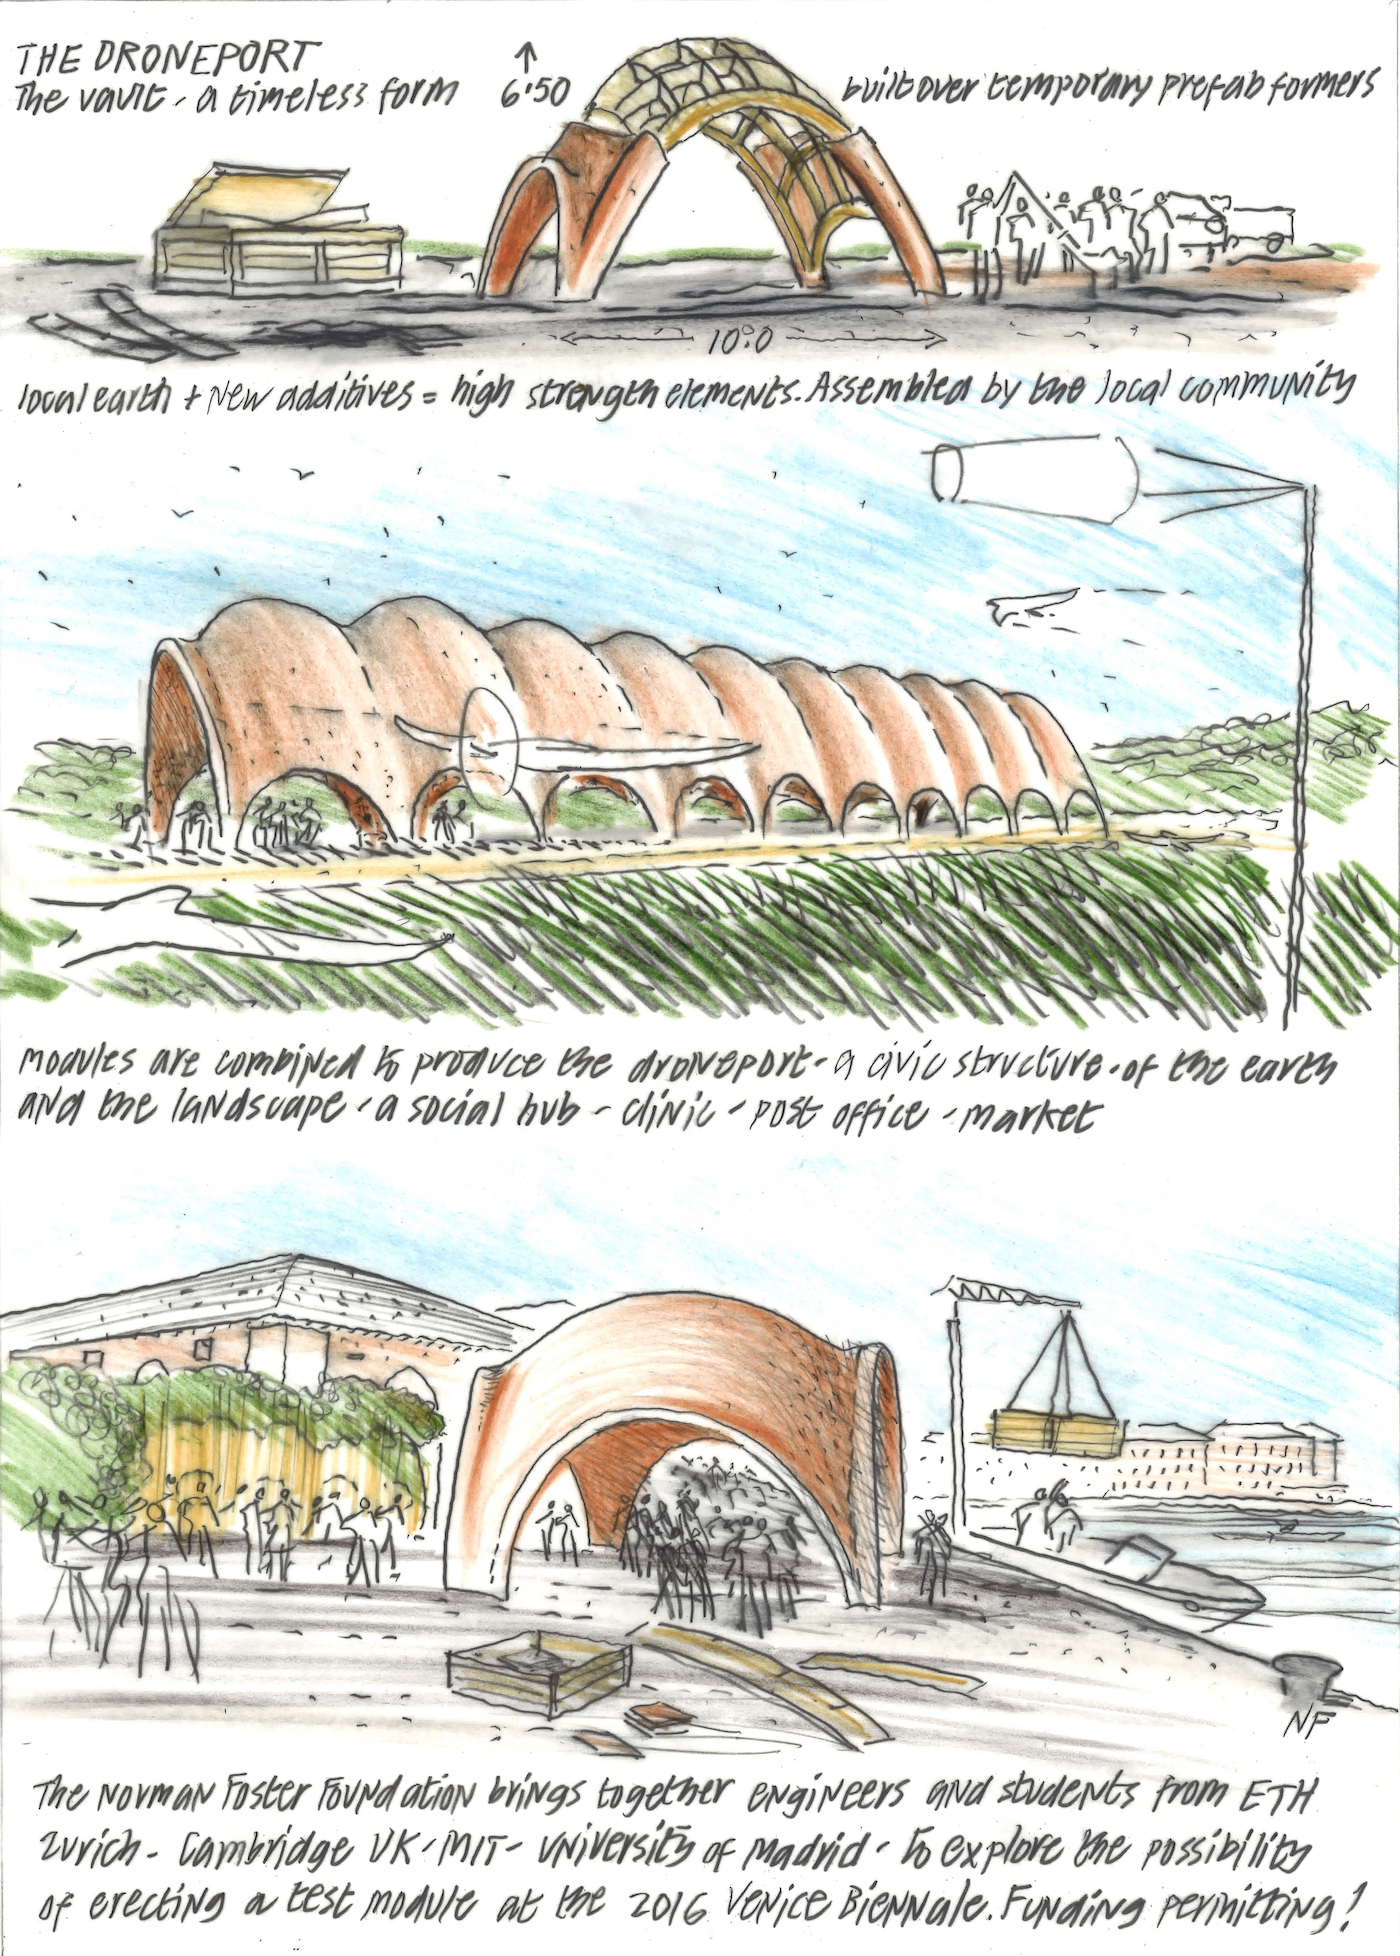 Norman Foster Concept Sketch 2